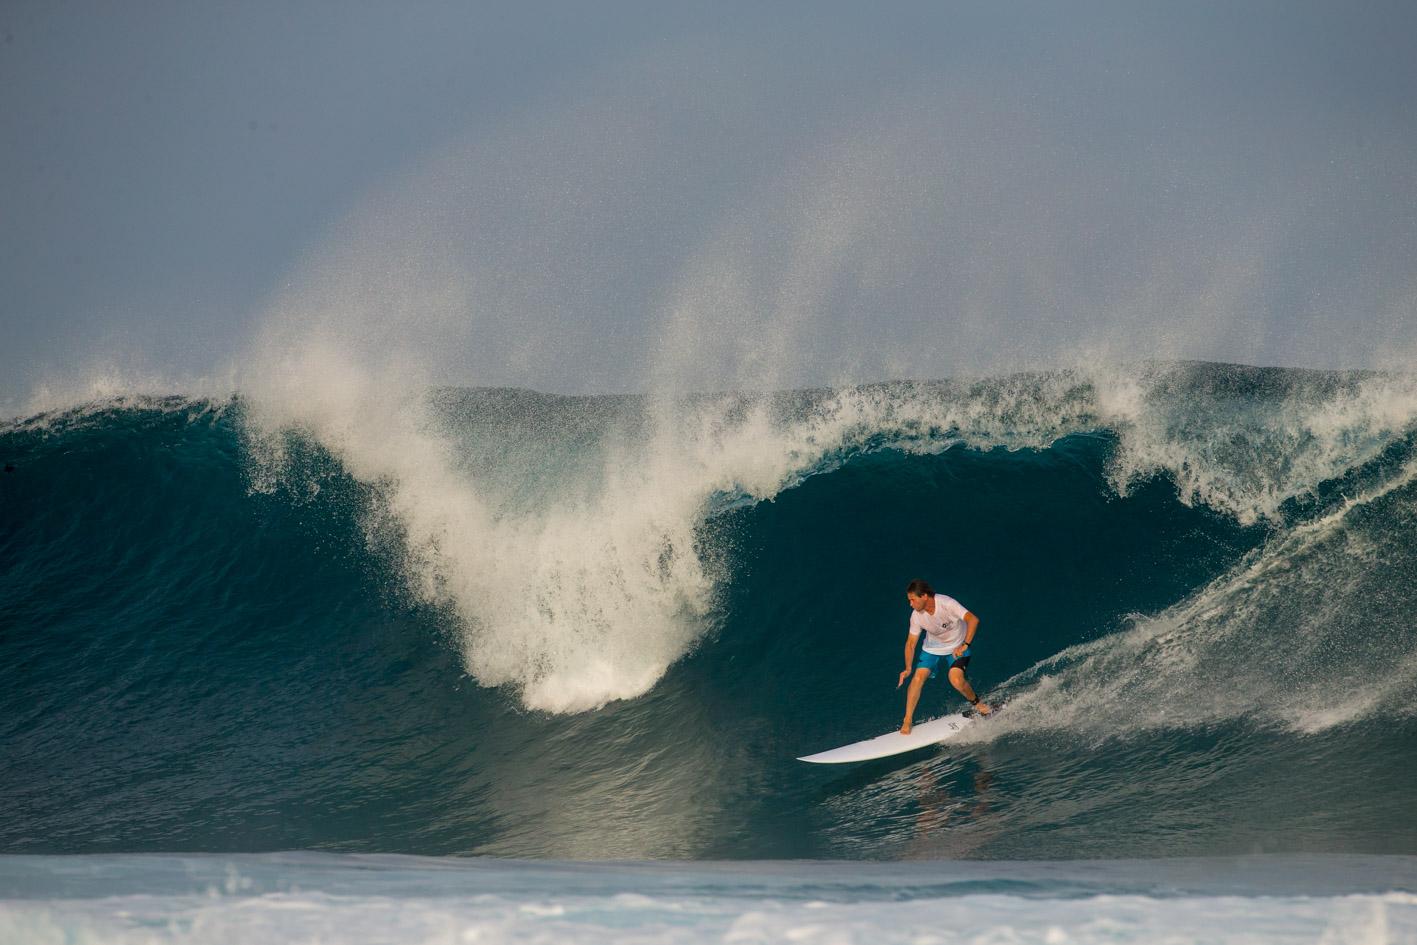 maldives, alex, surf school, moana, surf trip, surf destination, surfer, waves, torq surfboards, surfboards